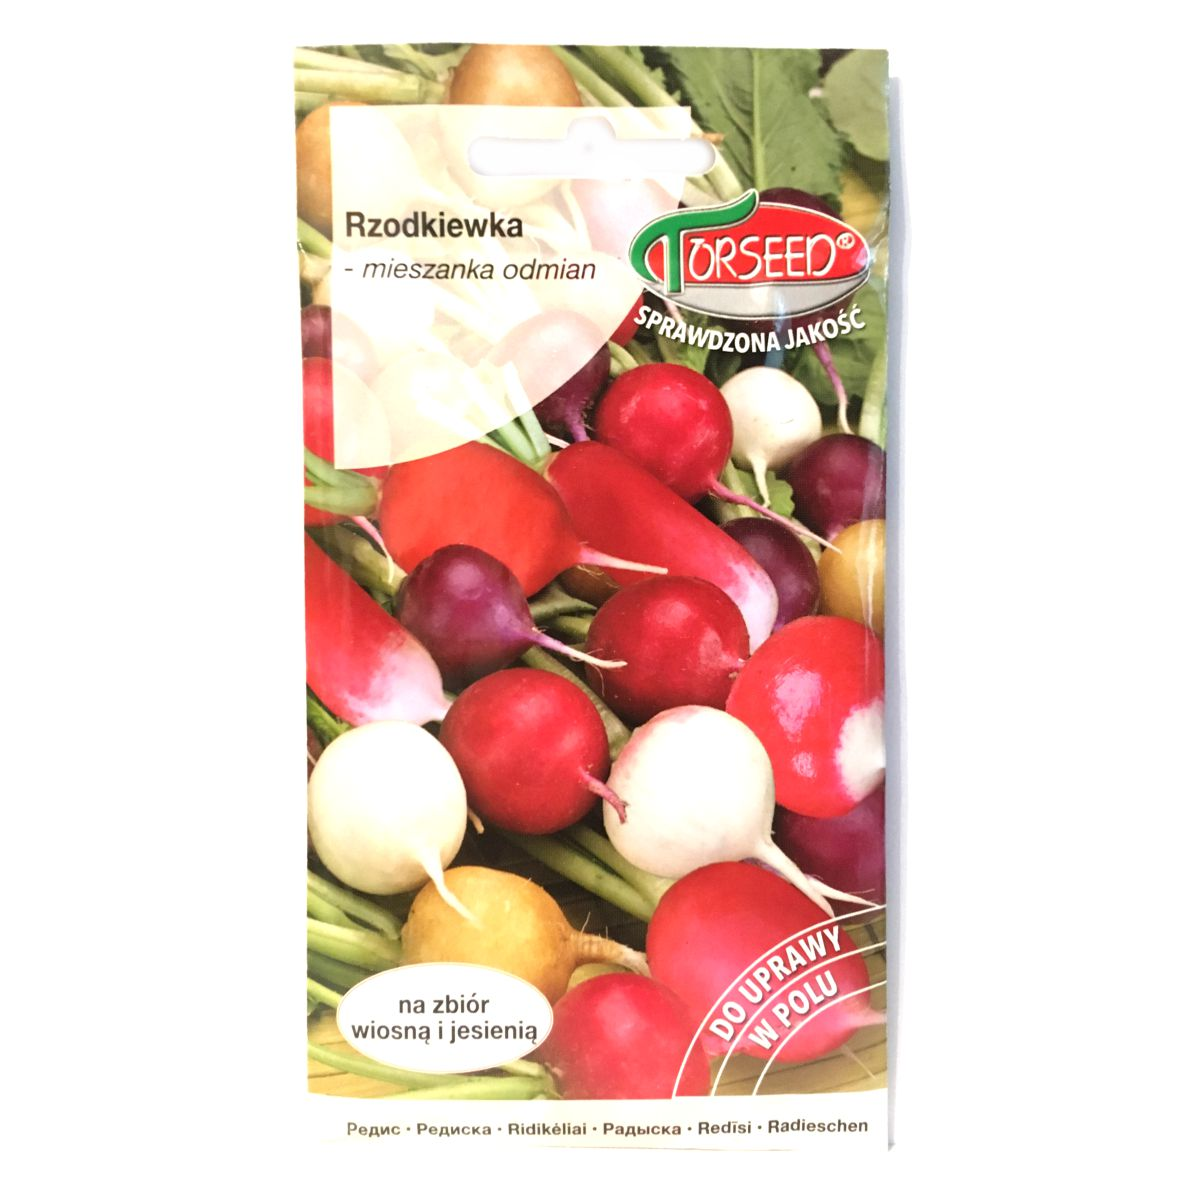 Rzodkiewka mieszanka odmian nasiona Torseed